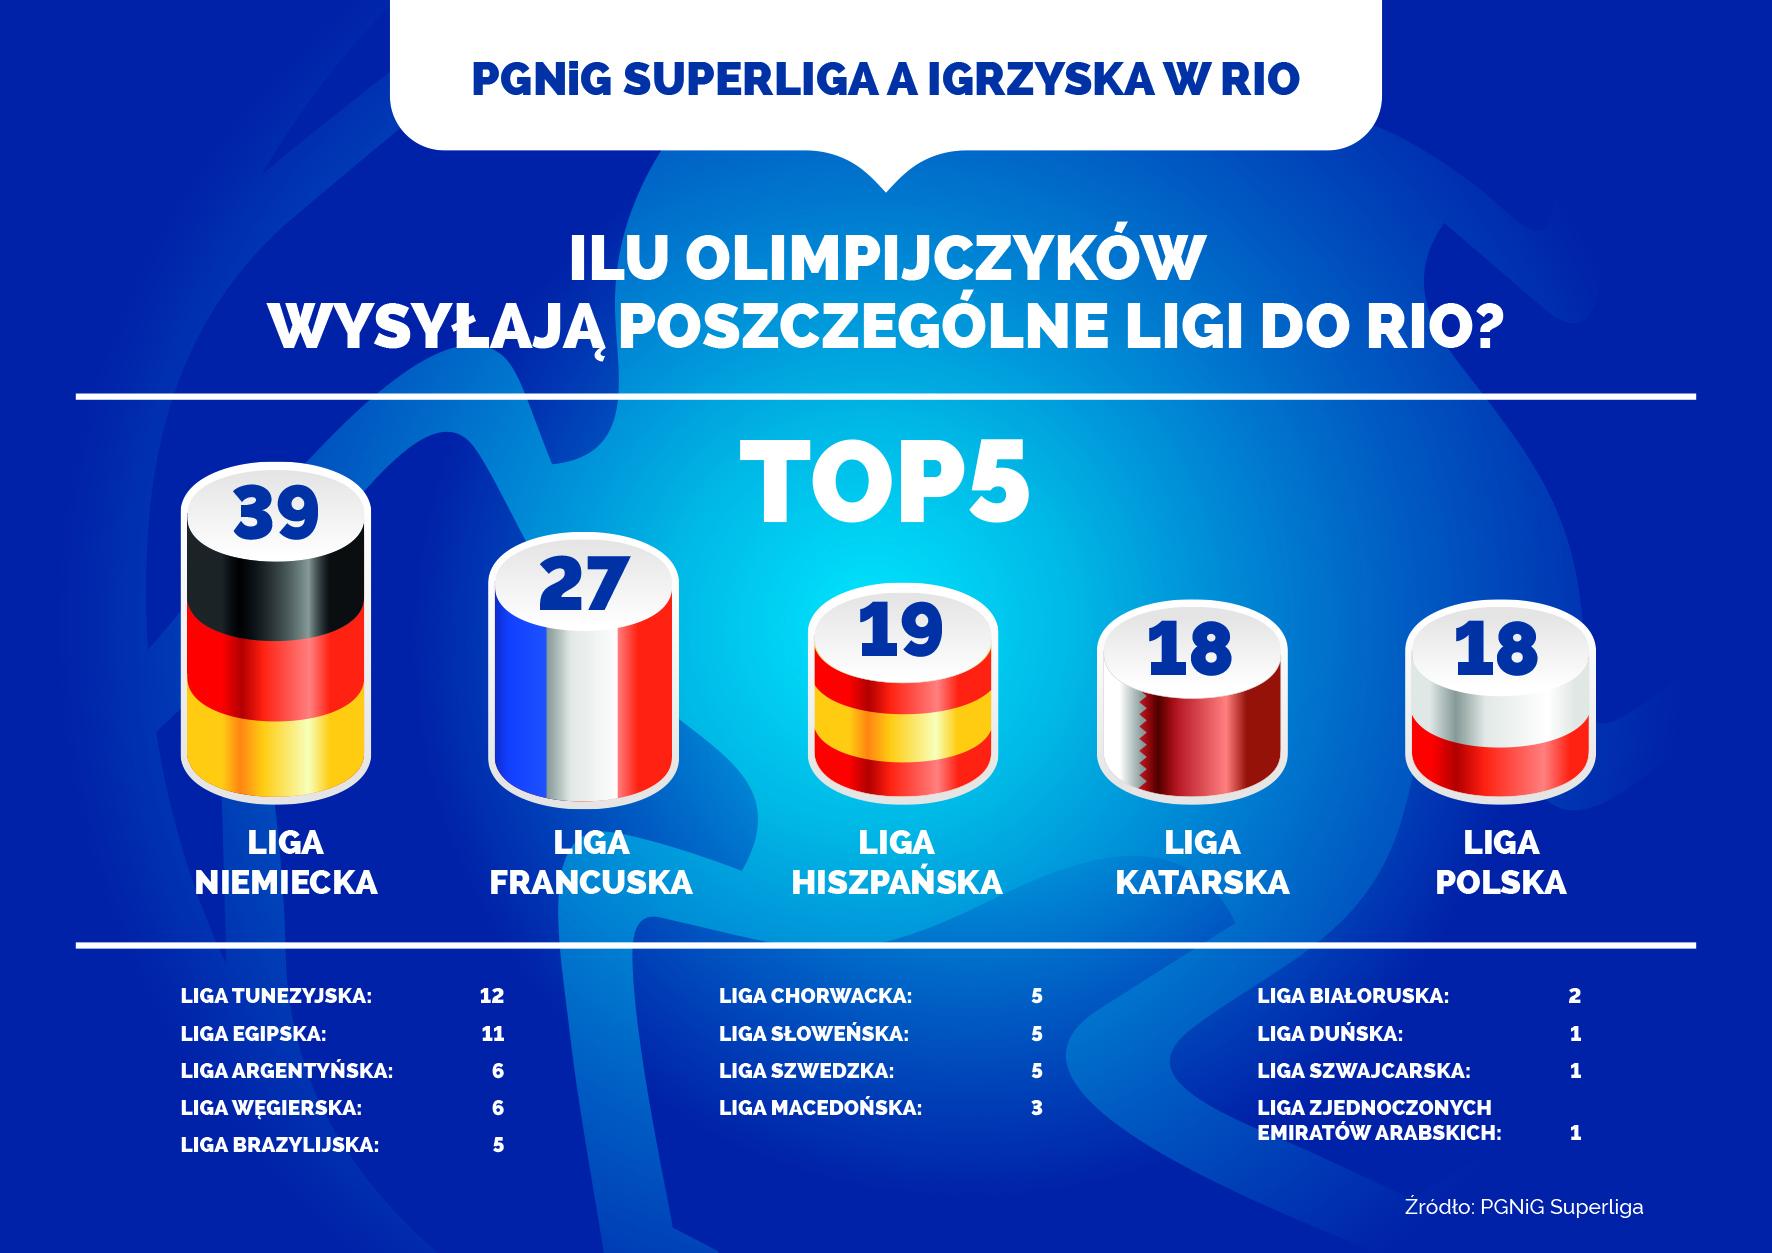 pgnig-superliga-infografika-RIO2016-1